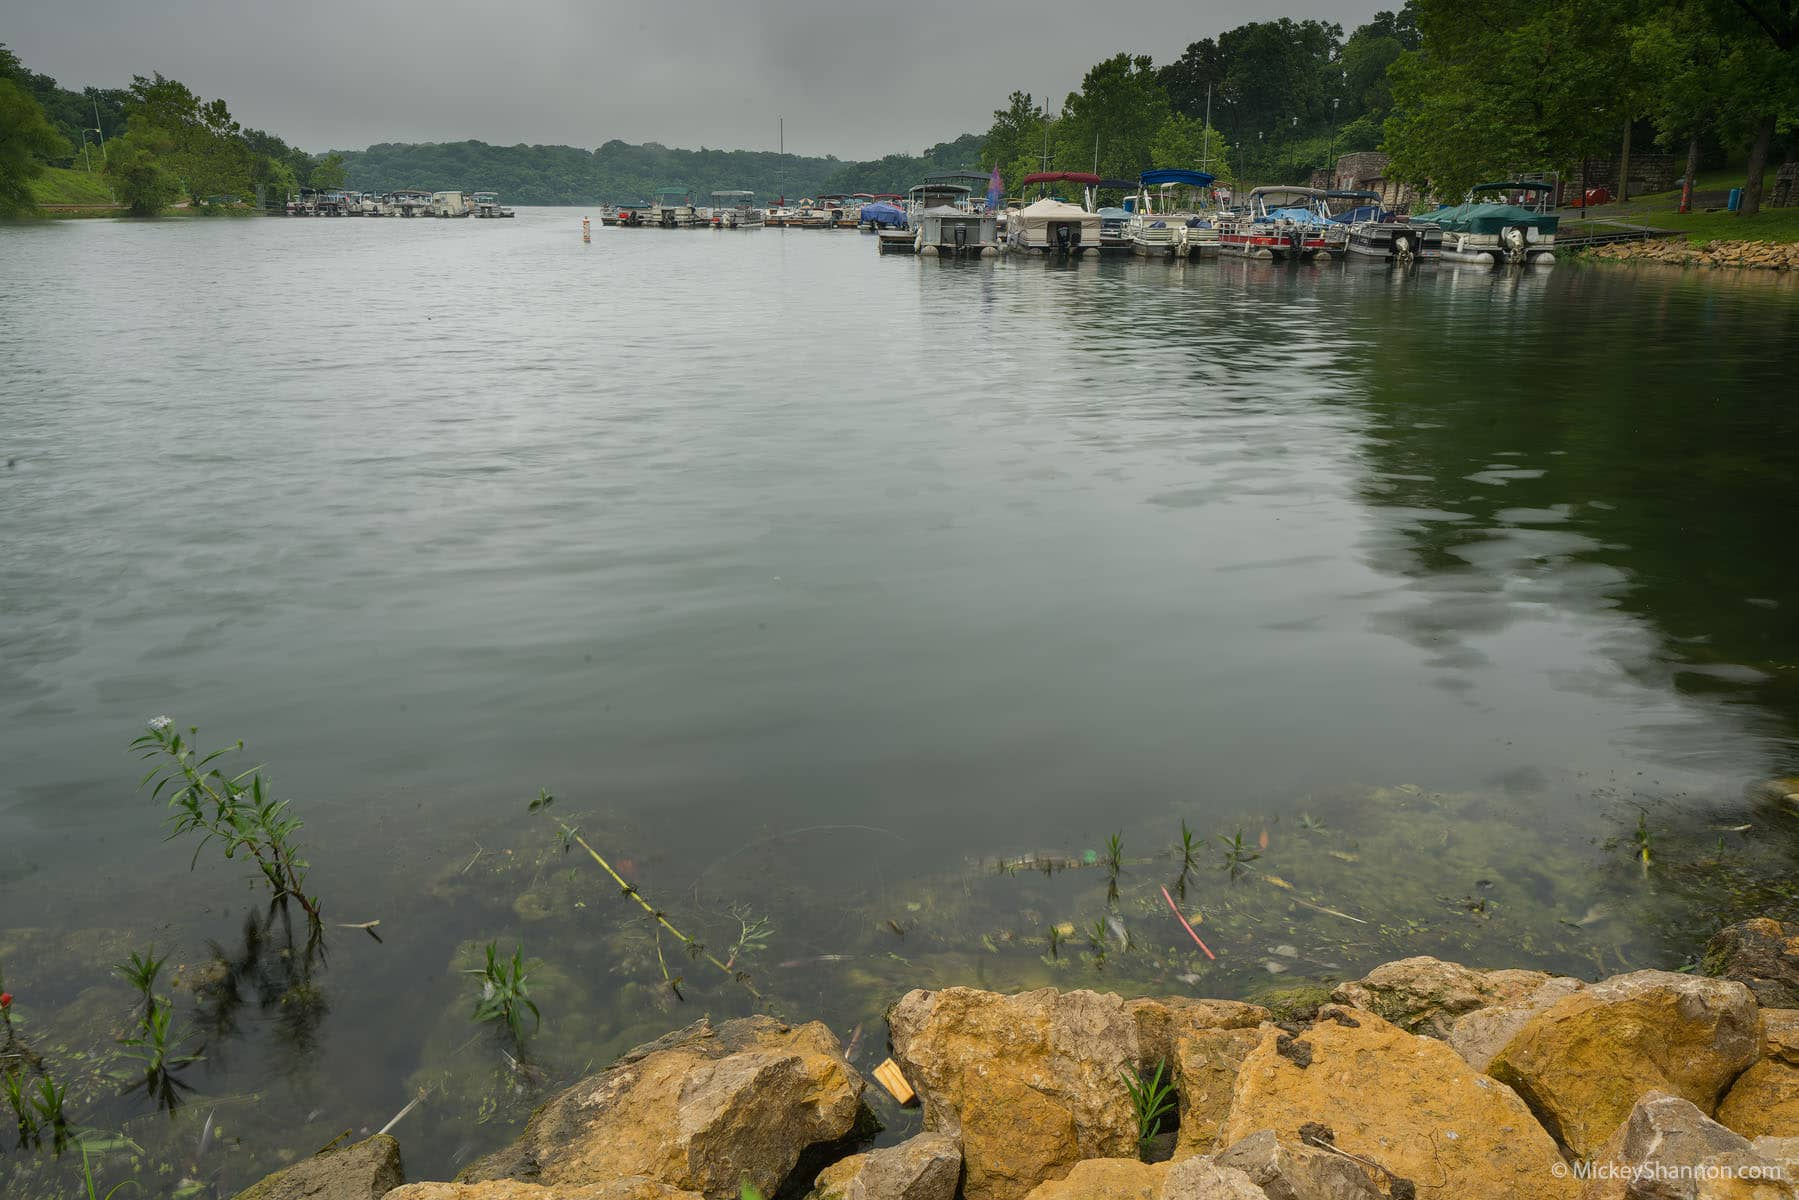 Wyandotte County Lake Park